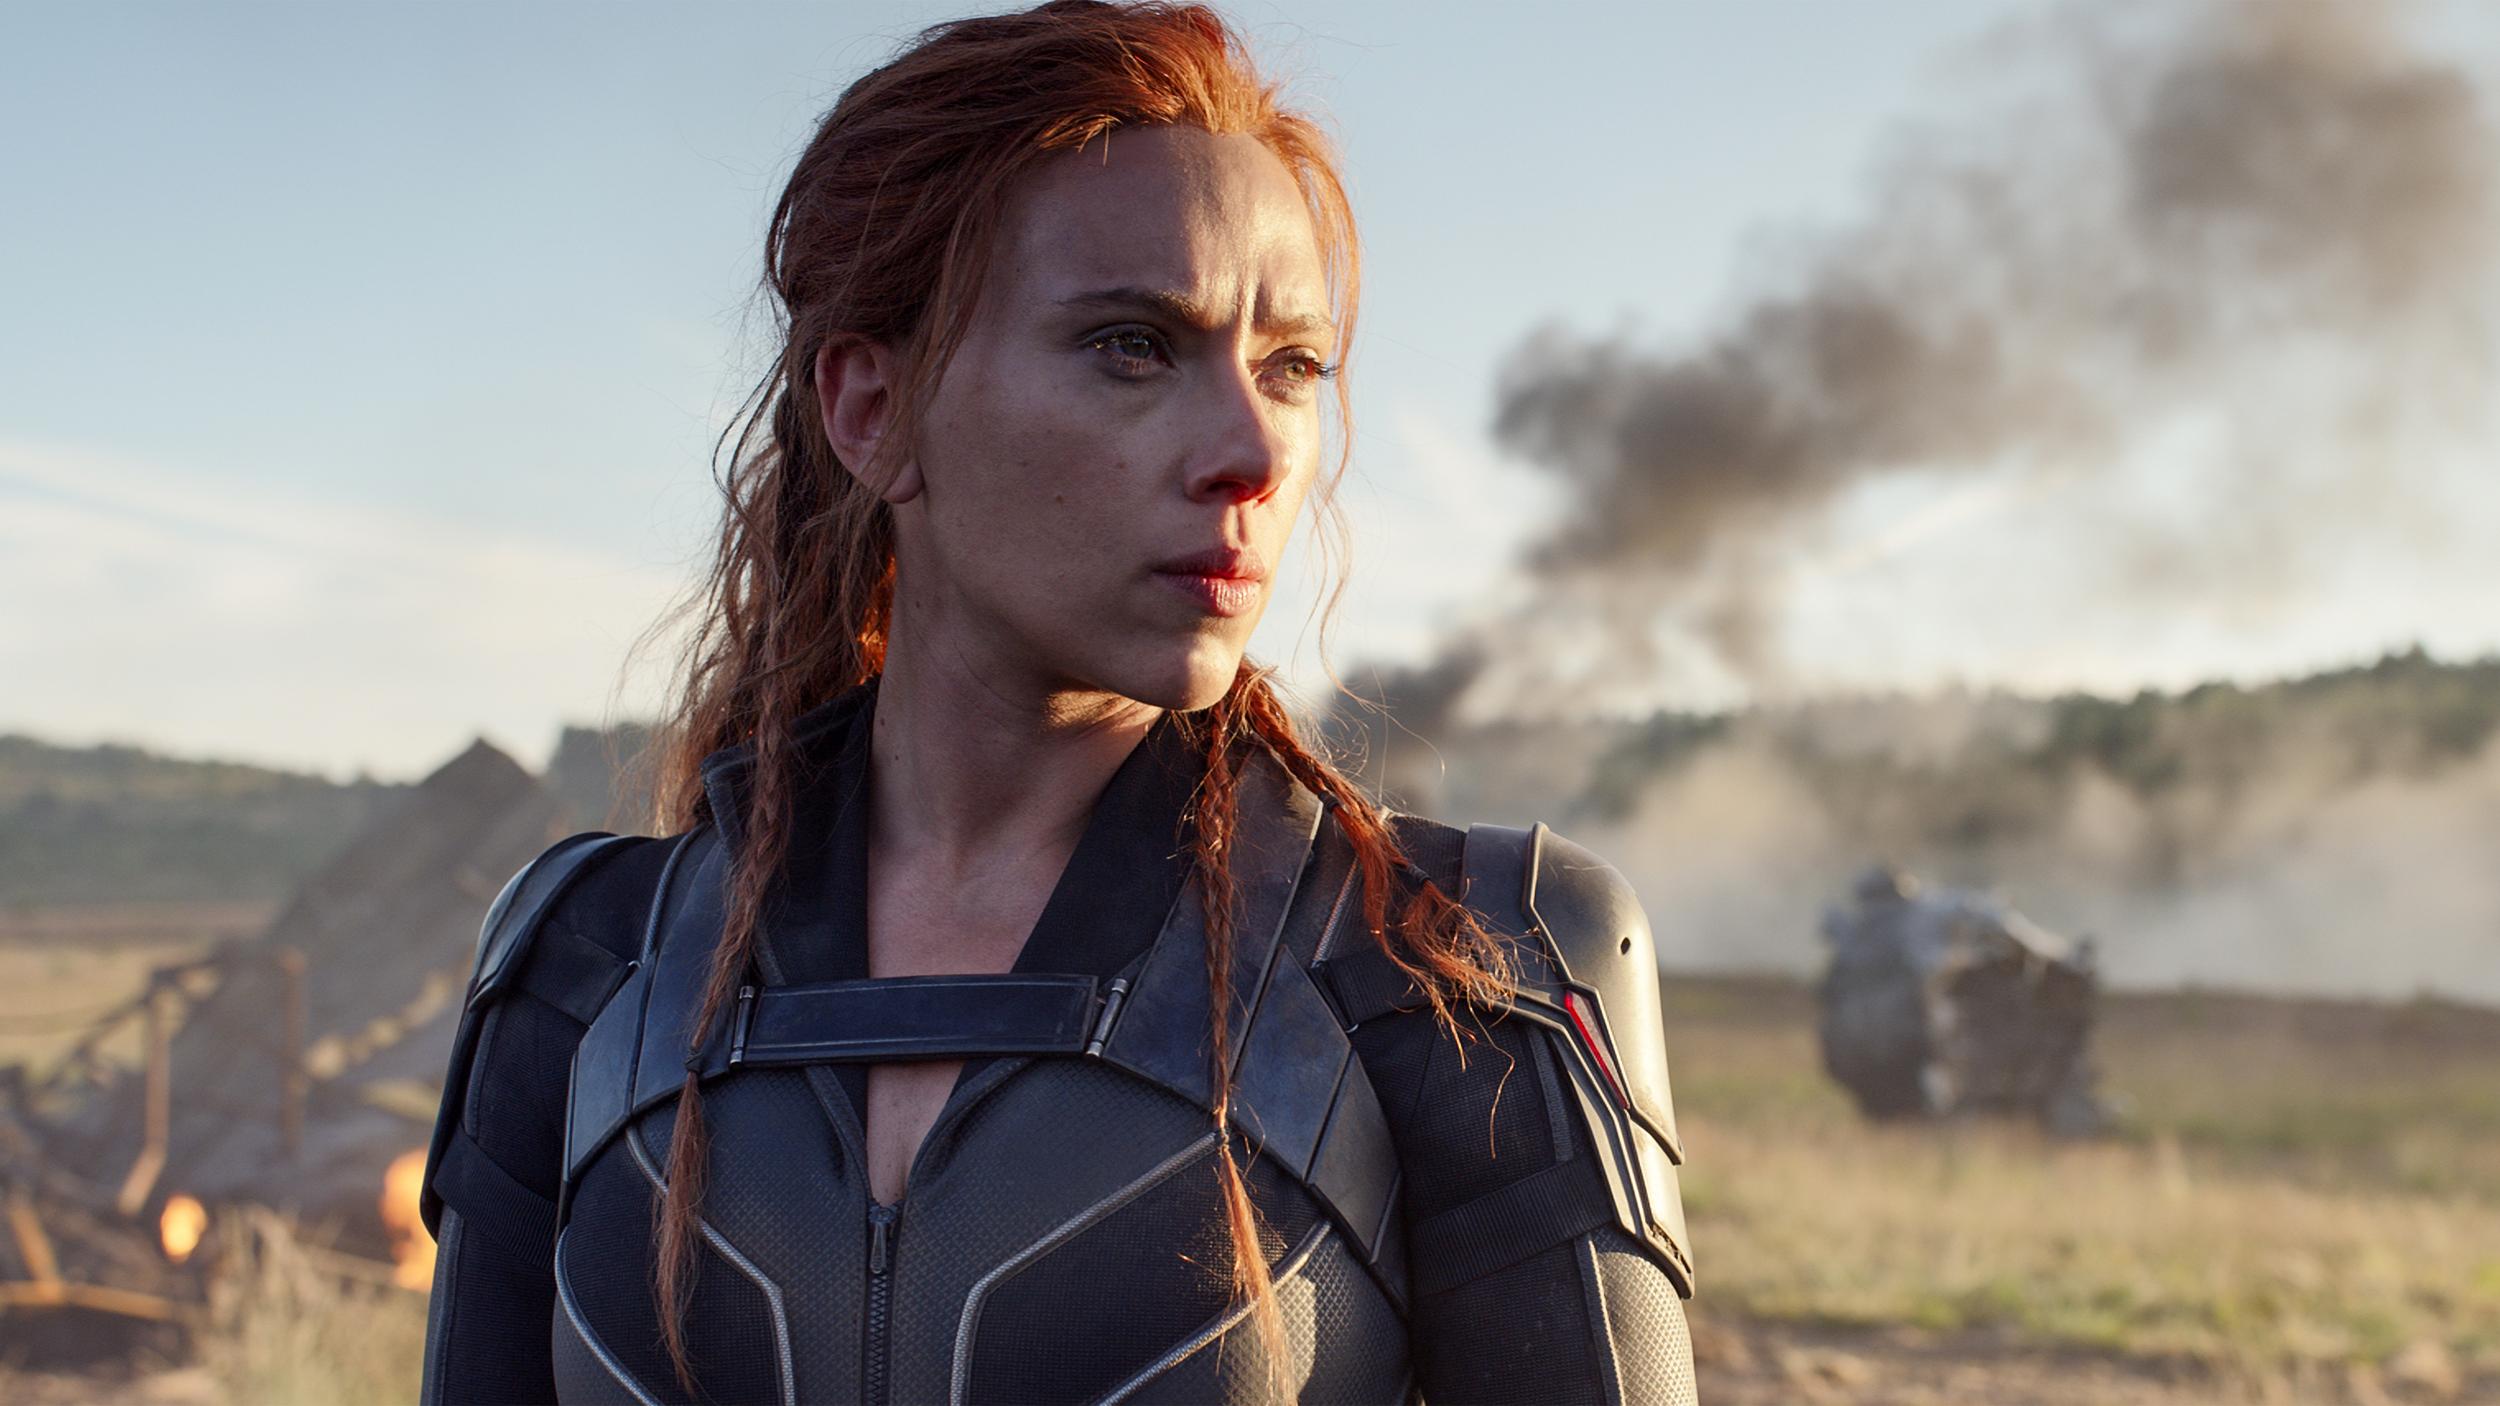 Disney tries to make Scarlett Johansson the villain in streaming lawsuit